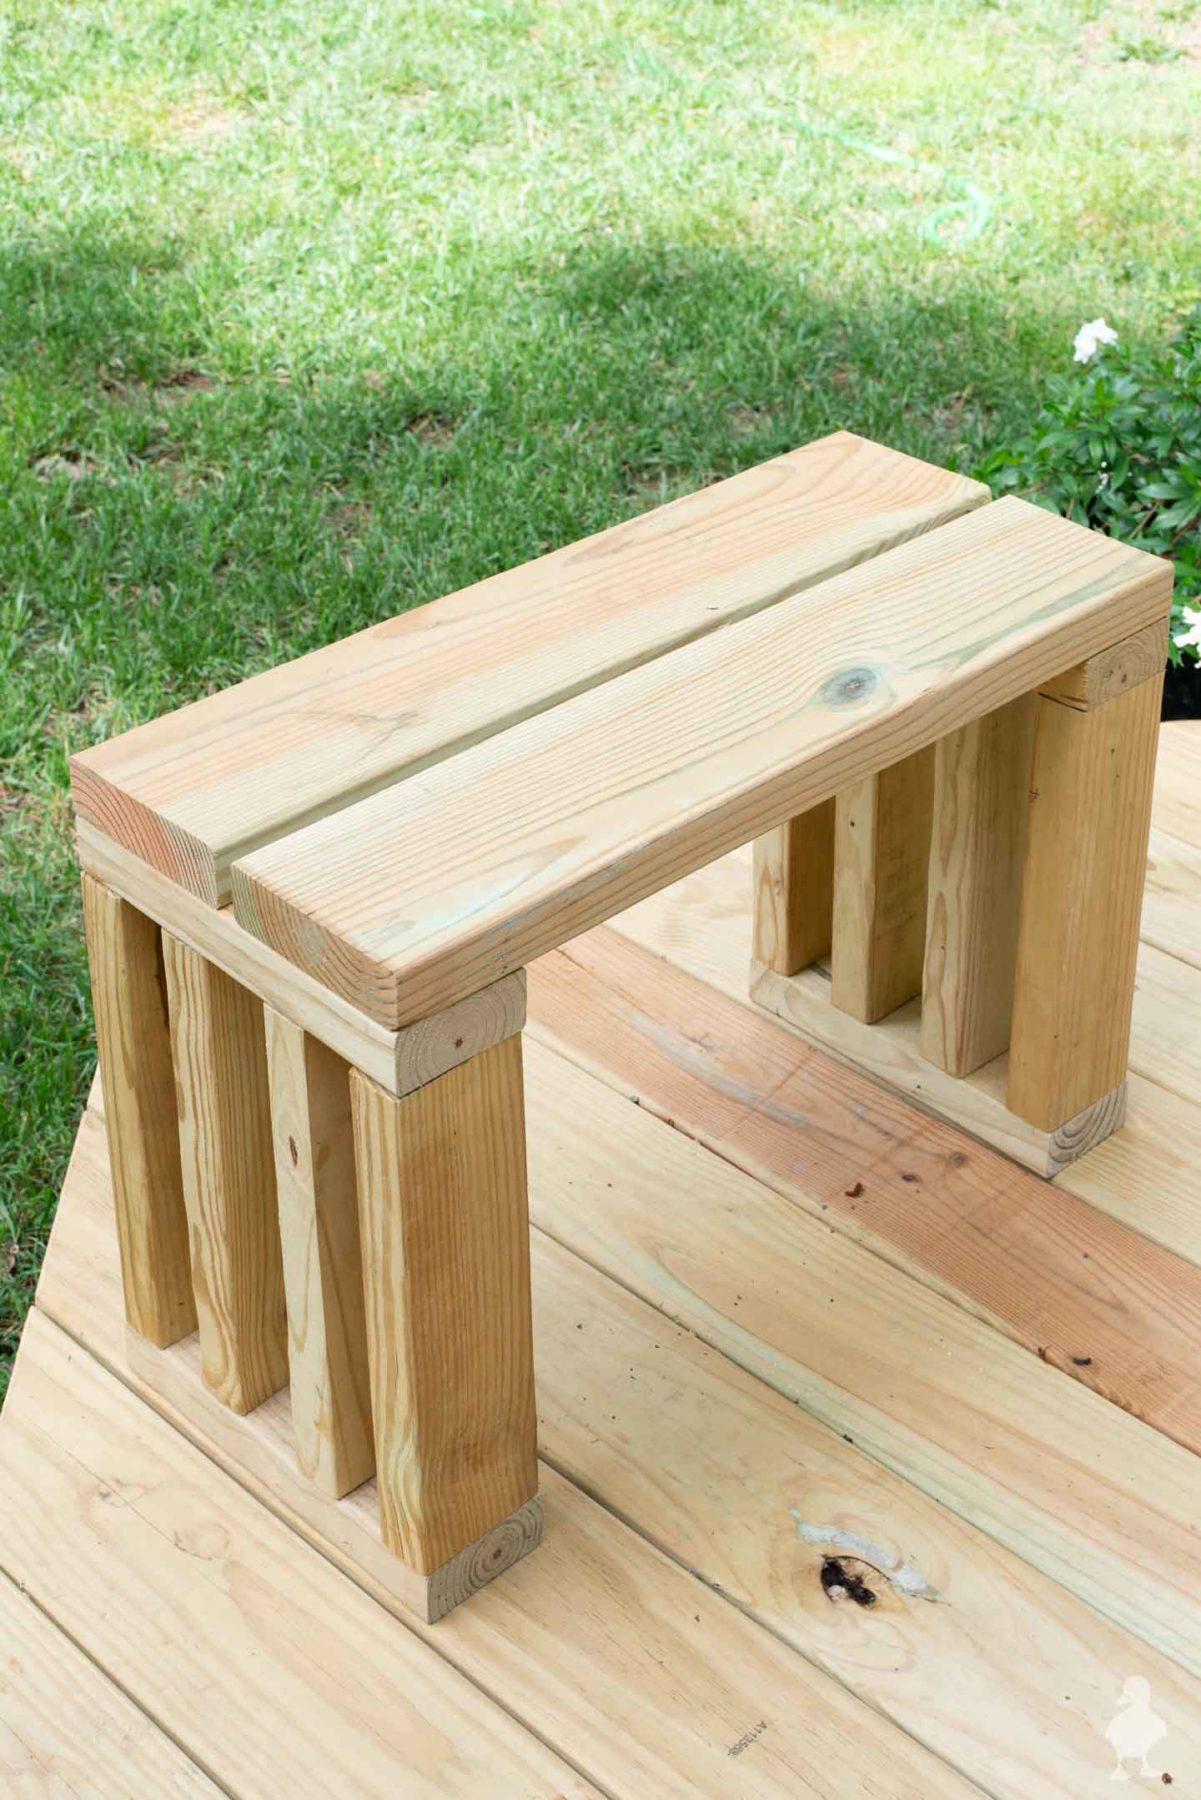 diy scrap wood outdoor bench seat - garden bench plans - 2x4s and deck boards